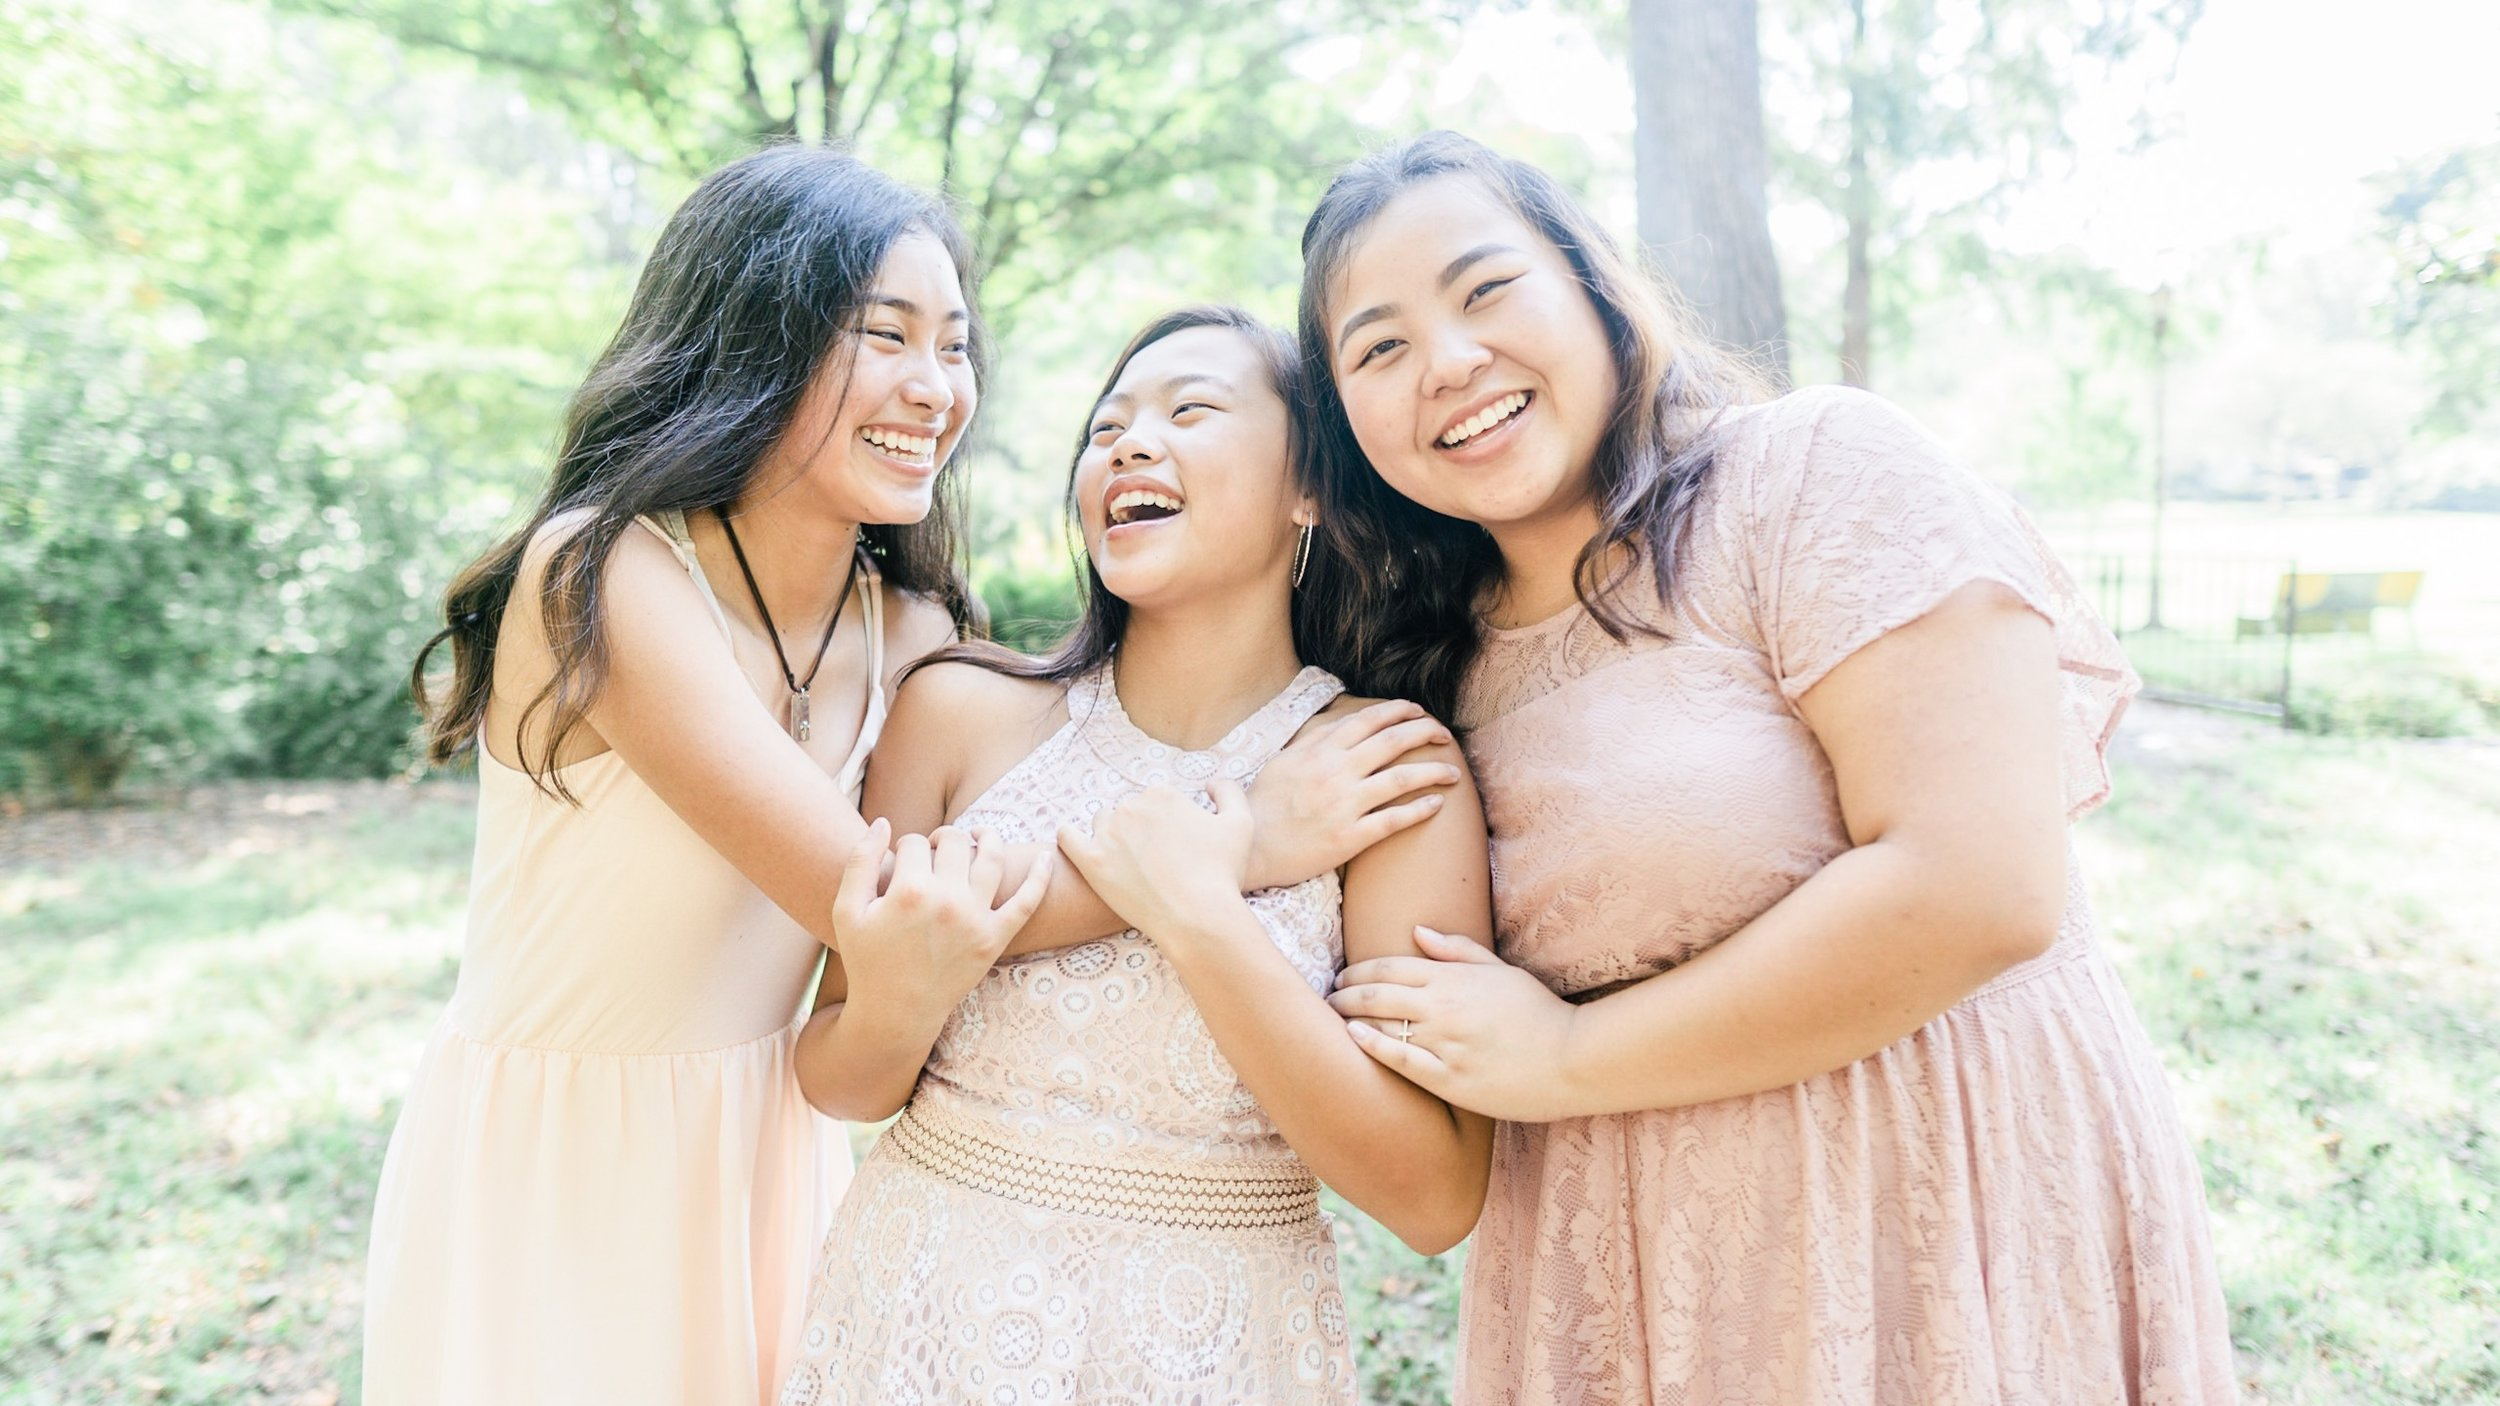 Friendship  - Creator |  Sarah Lee